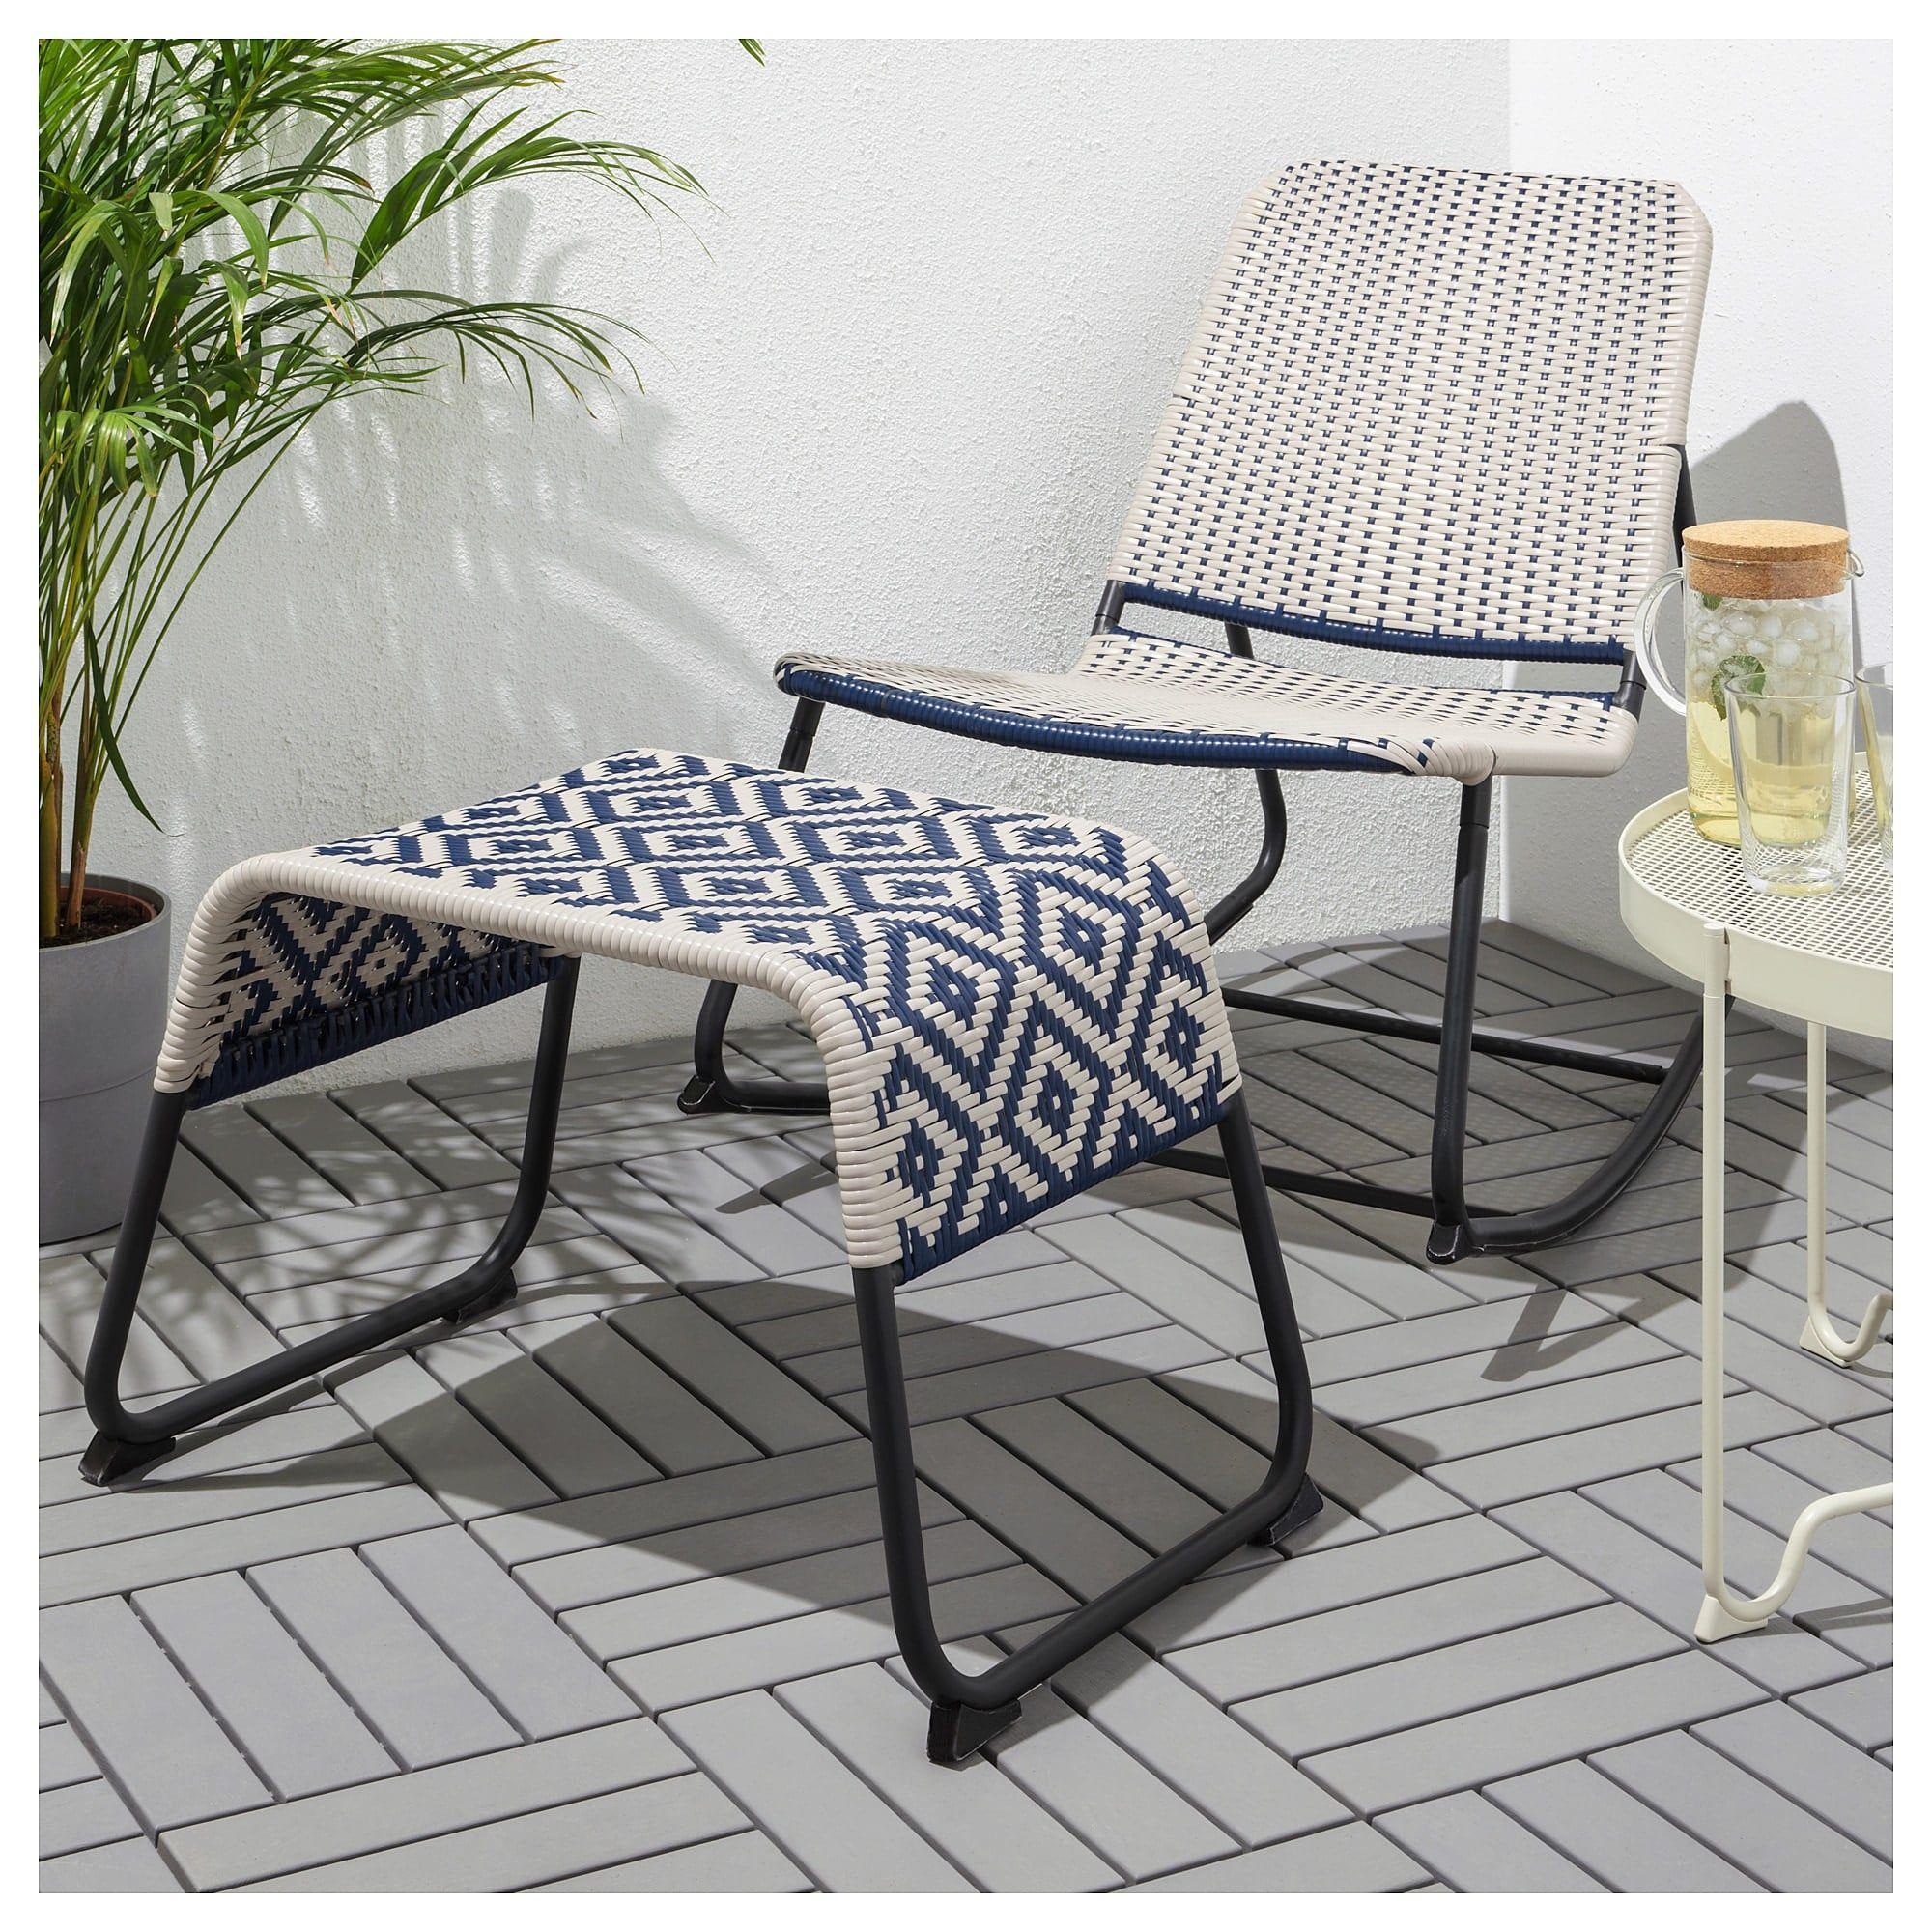 Överallt Footstool Ikea outdoor, Used outdoor furniture